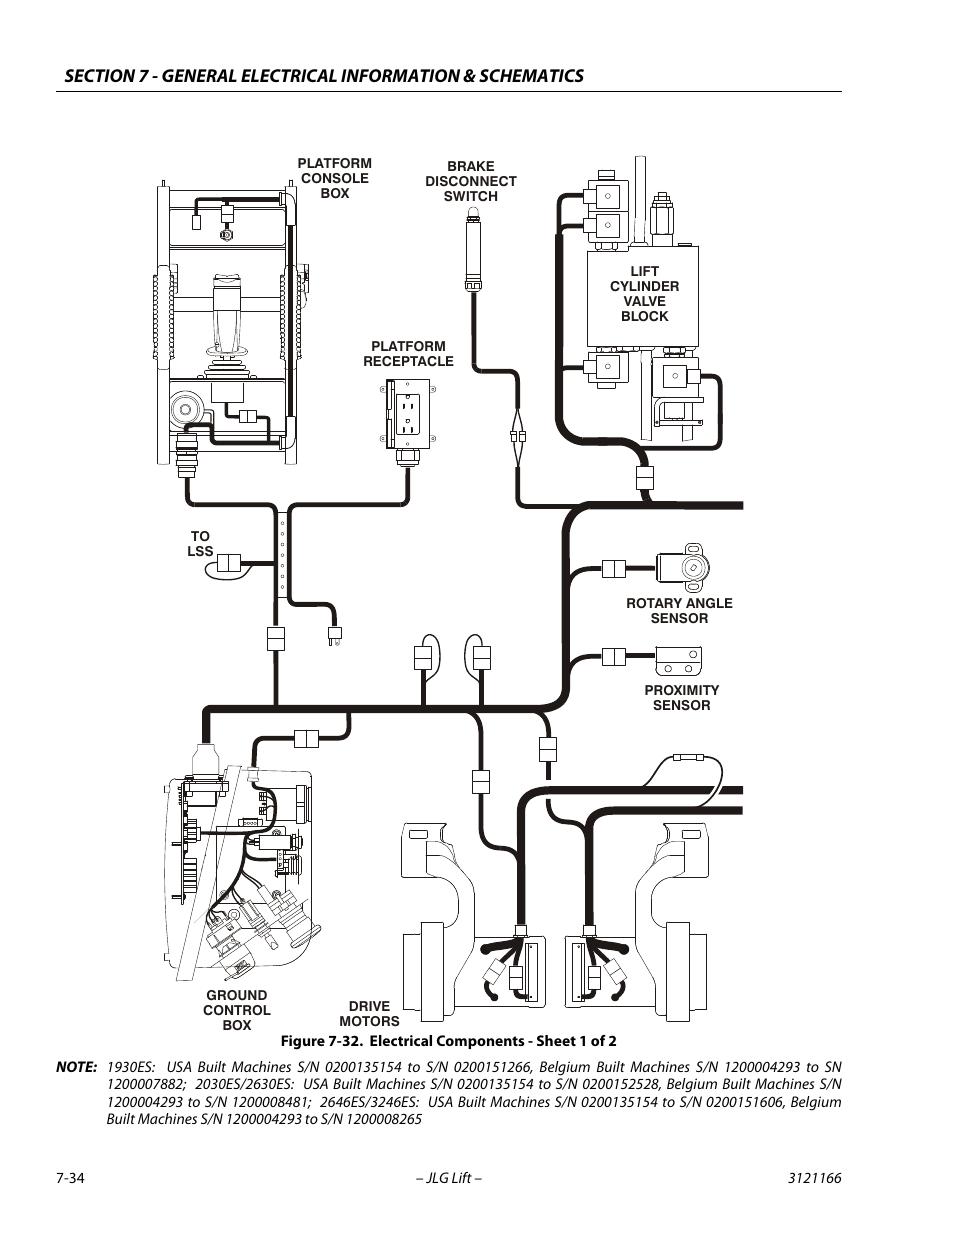 jlg model 80 wiring diagram 2000 ford f 150 fuel pump wiring 2000  jlg 20mvl wiring diagram free download wiring diagrams jlg 3246es service manual page210 jlg 20mvl wiring